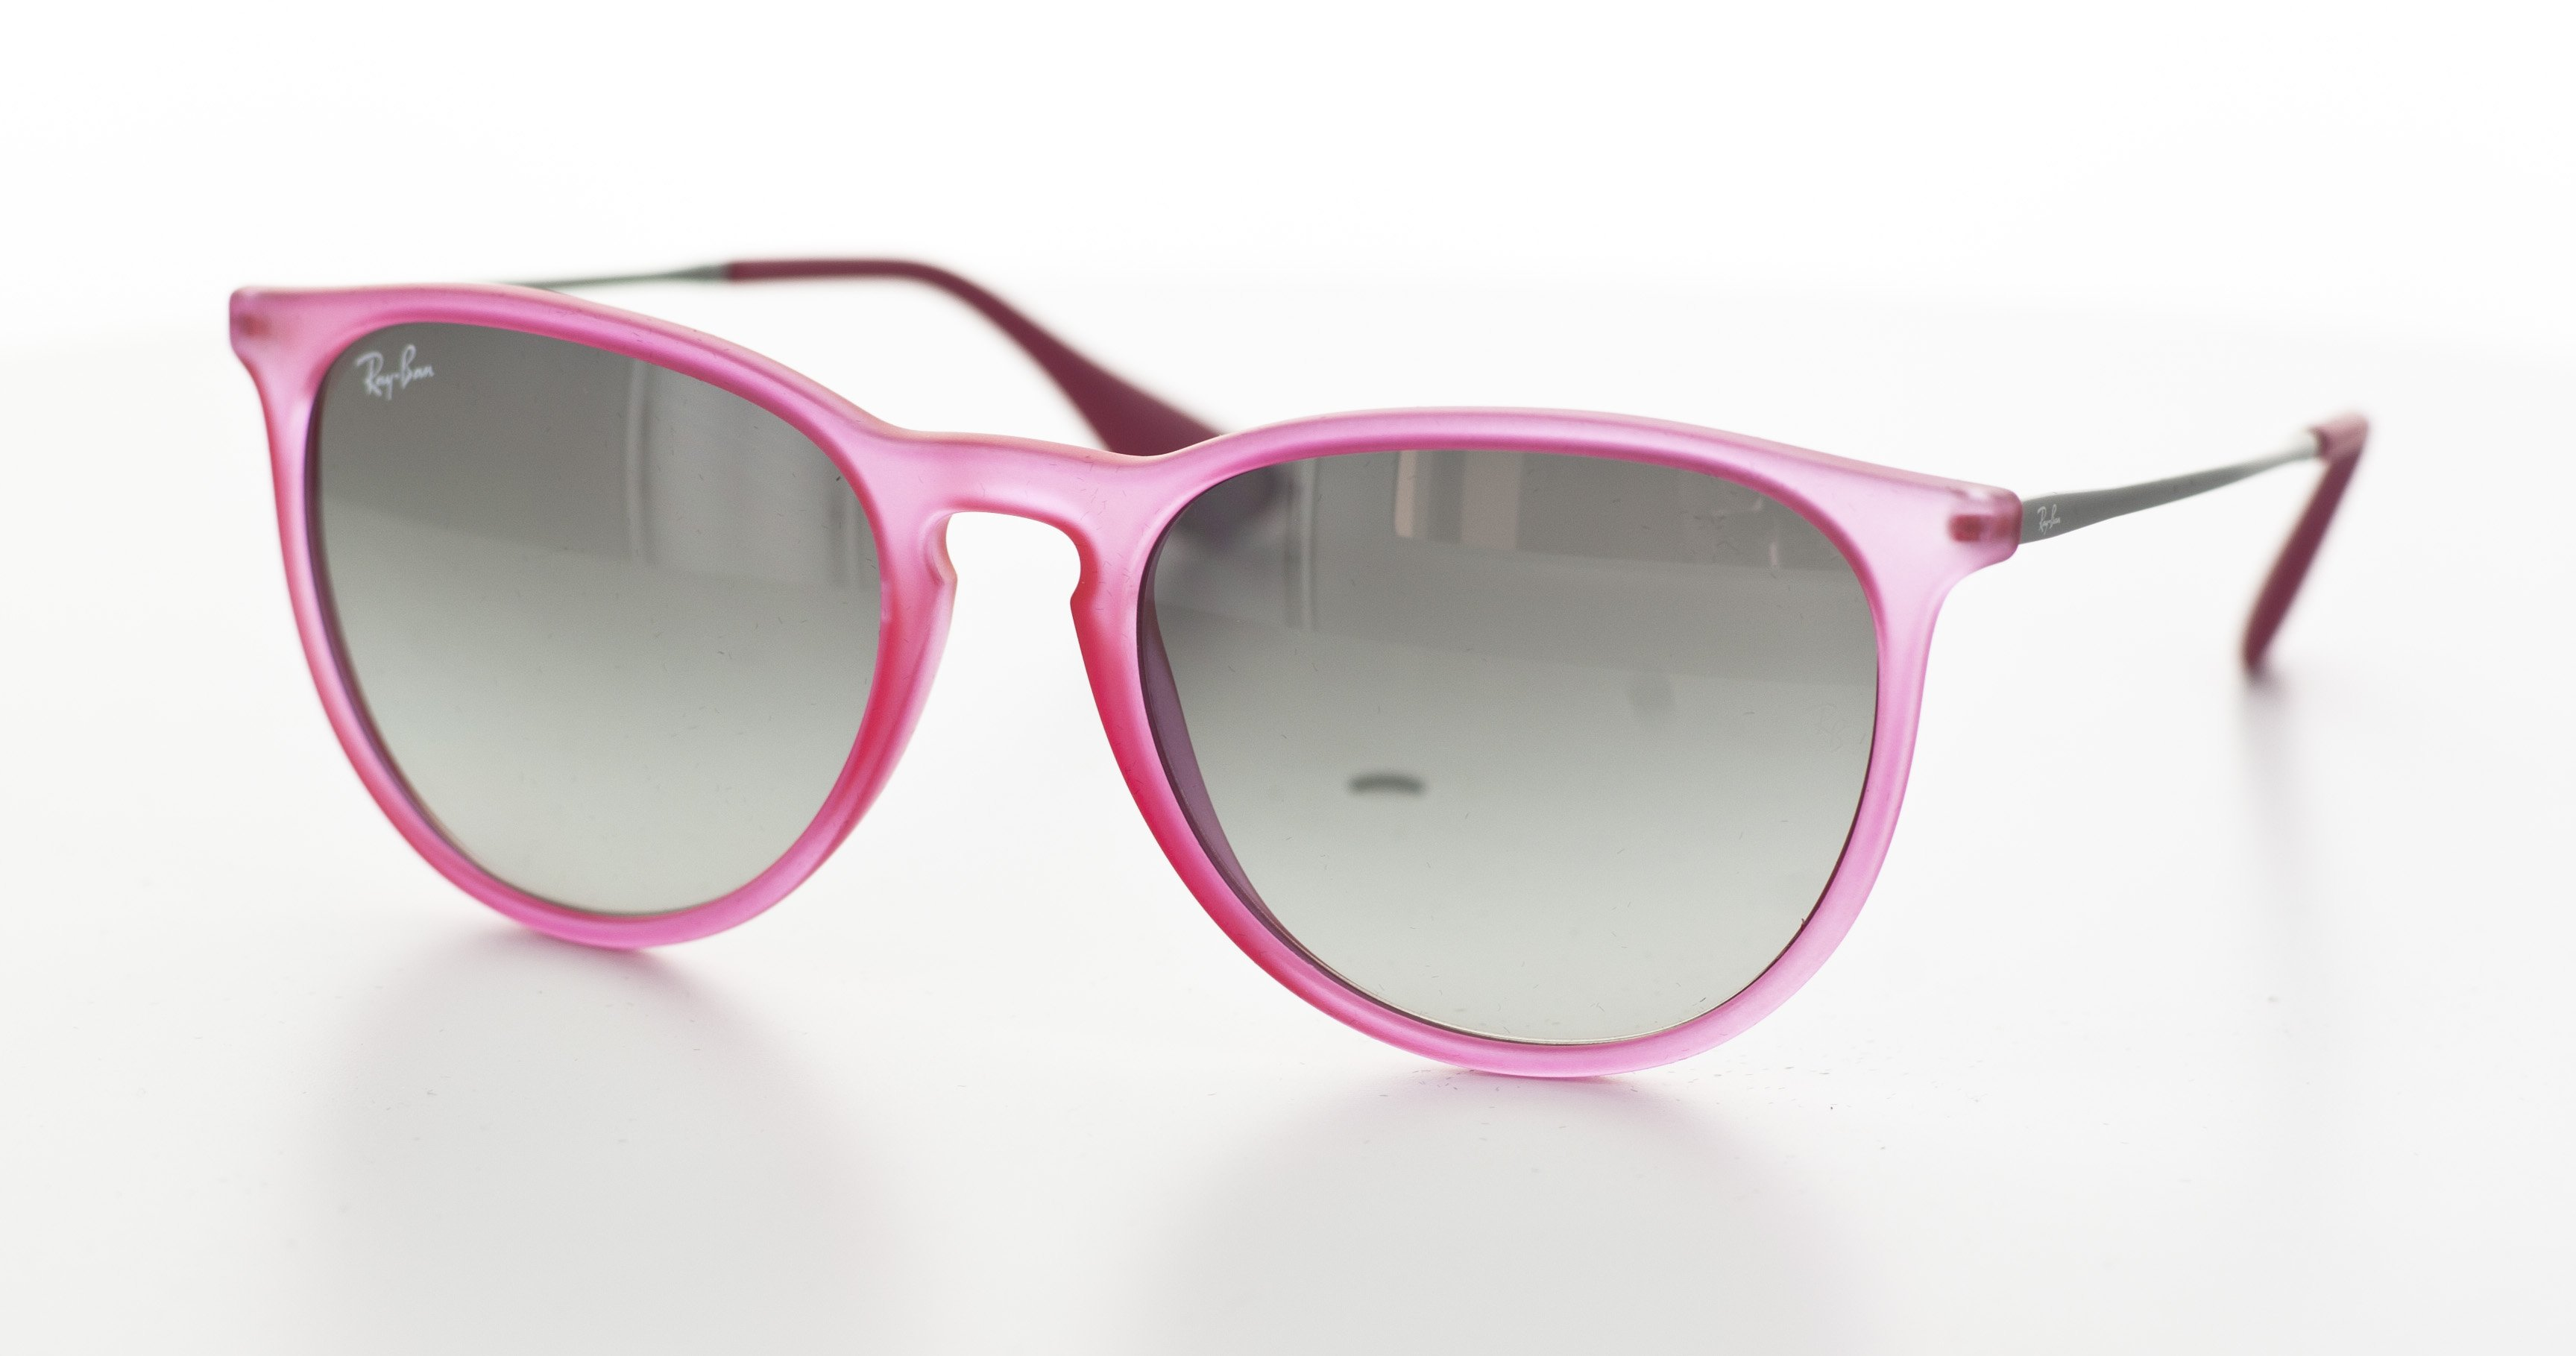 5630a9b09fce7 gafas ray ban rosas